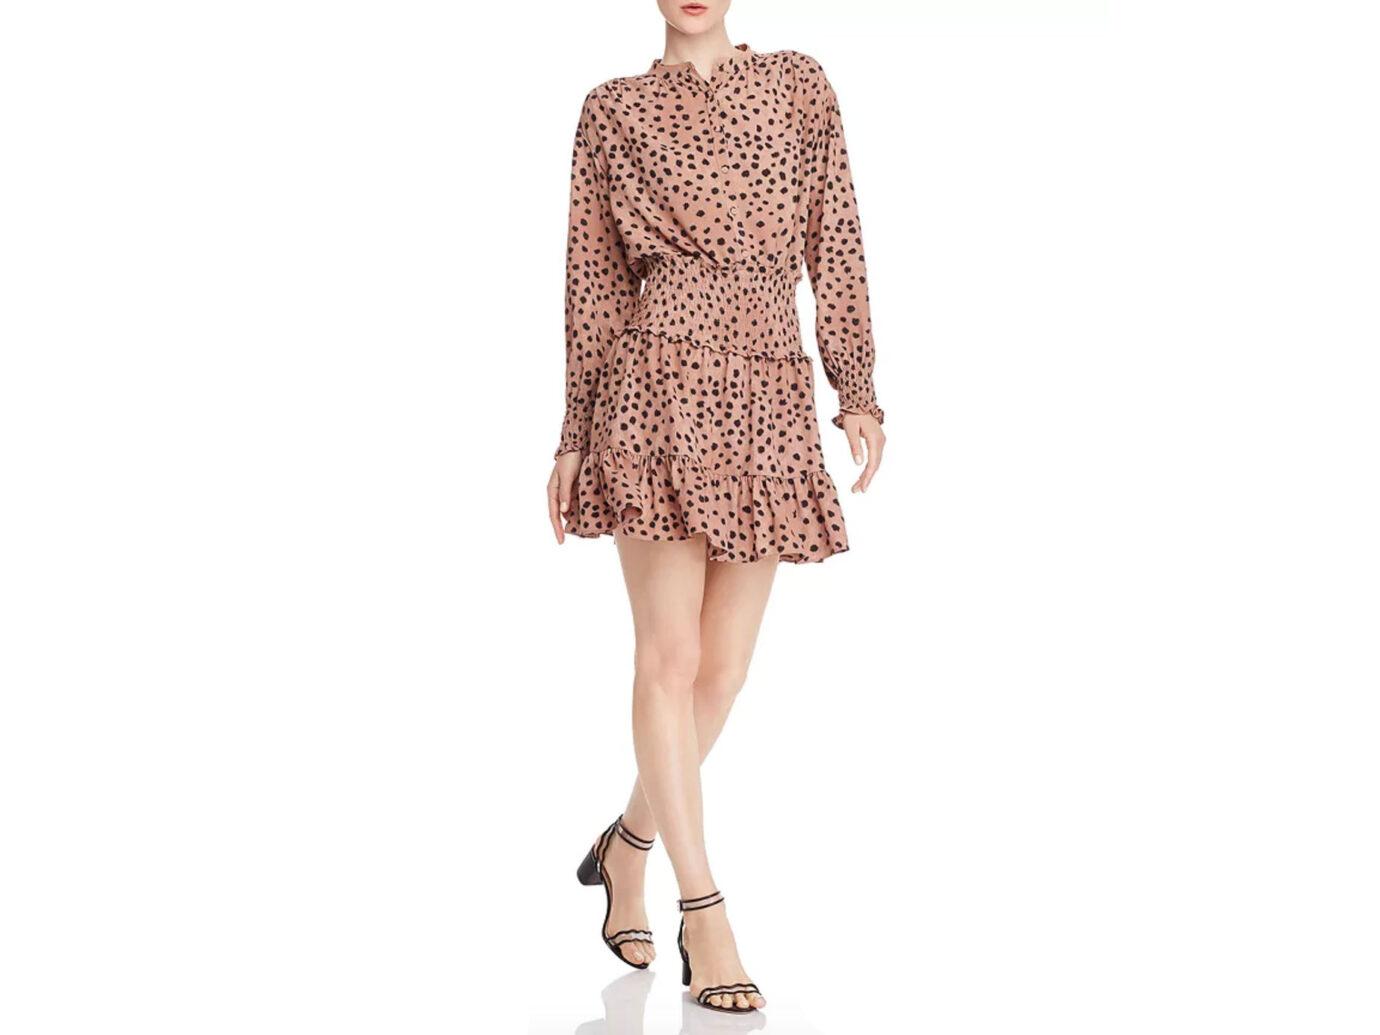 La Vie Rebecca Taylor Le Faune Cheetah-Print Smocked Dress